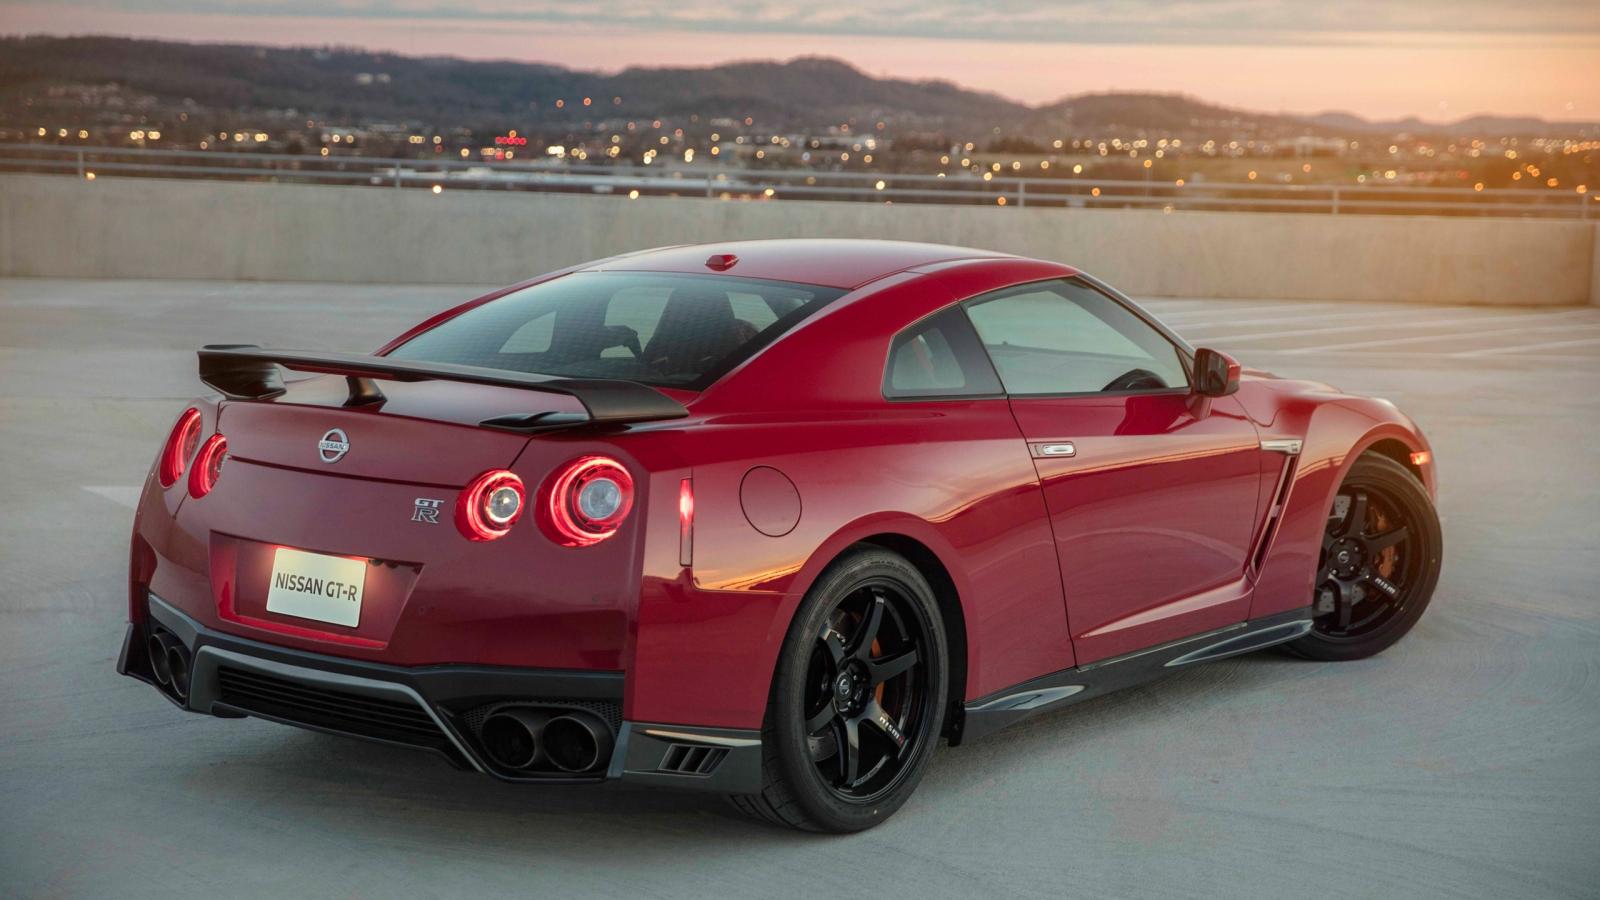 1600x900 wallpaper Nissan GT-R, rear view, red car